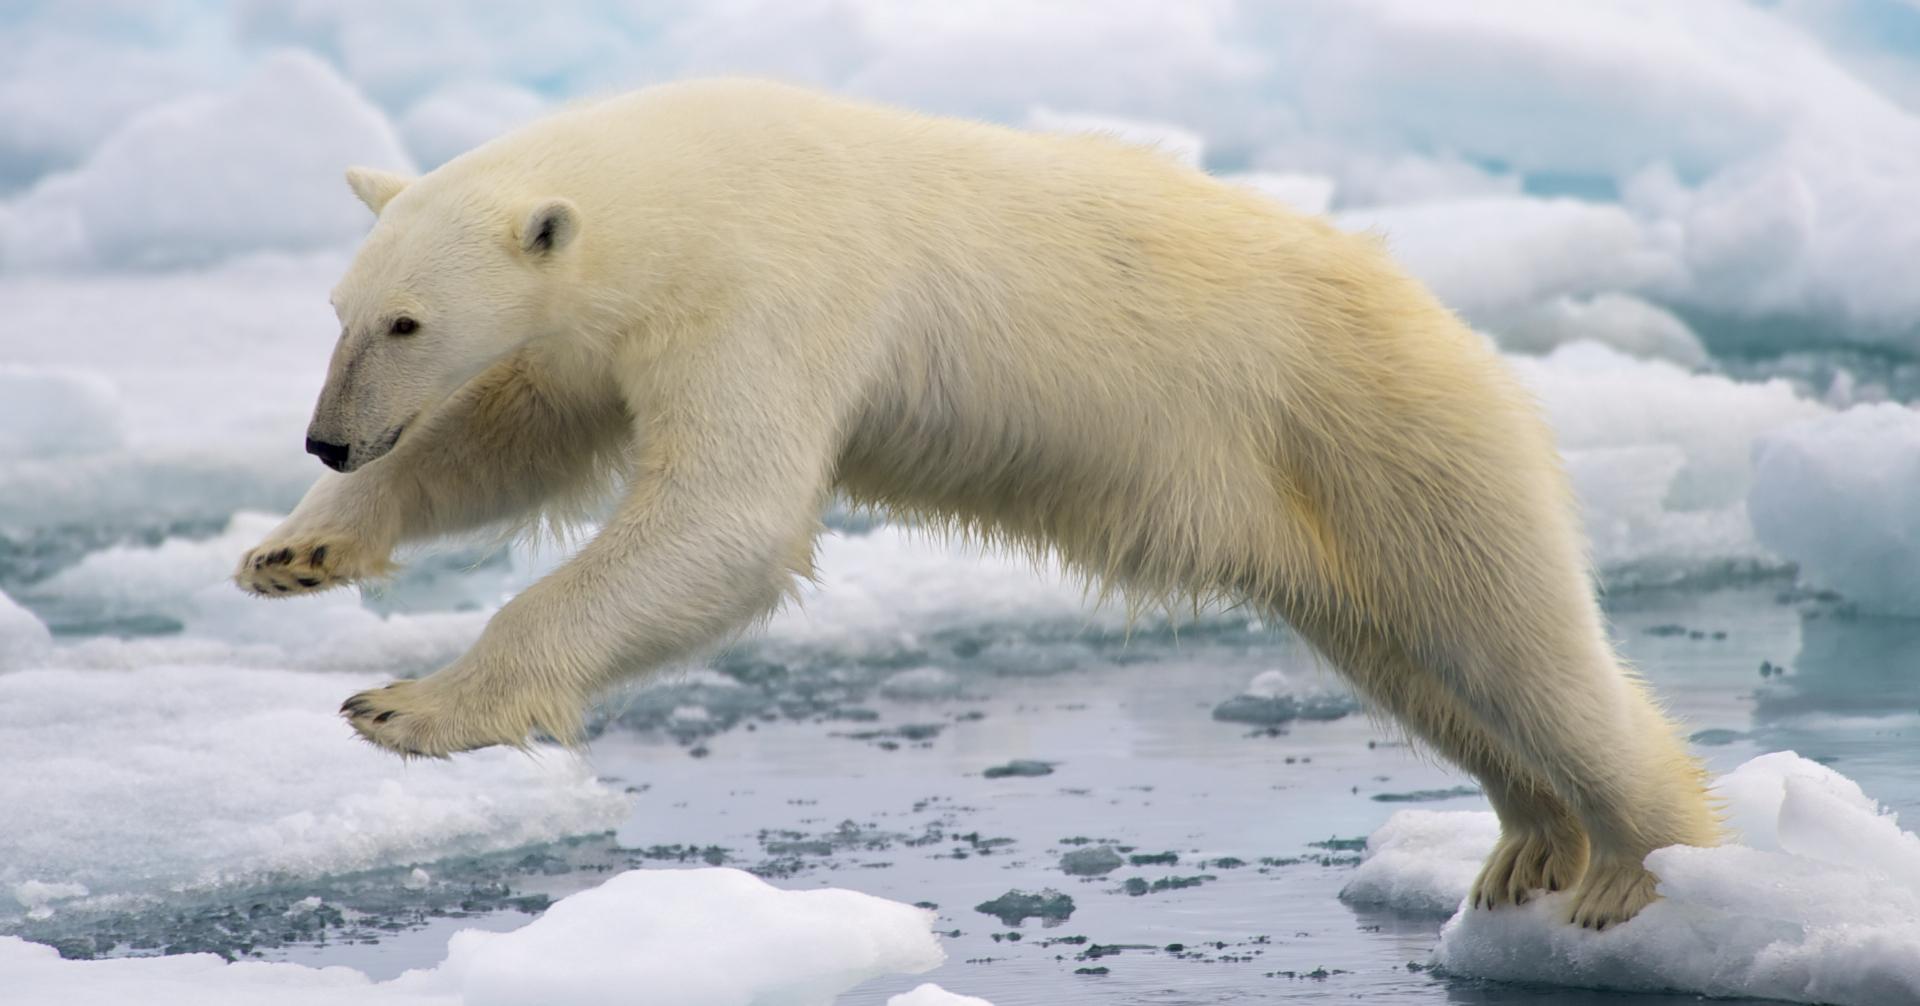 Polar_Bear_AdF.d7a5d33f69d8466c85f2846729978eb6.jpg